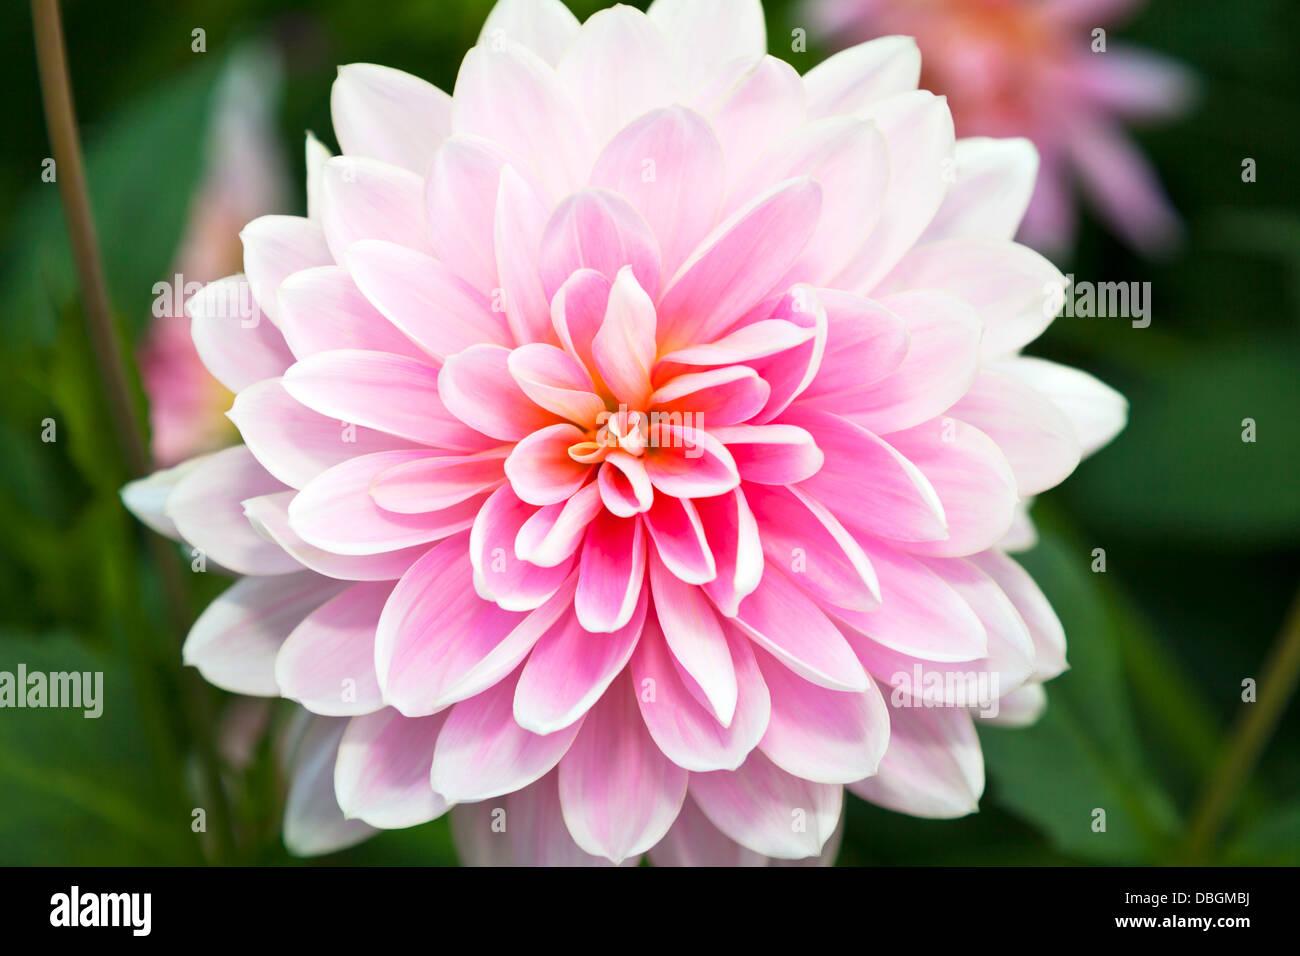 Typical English Garden Plants Flowers Pink Chrysanthemum Often